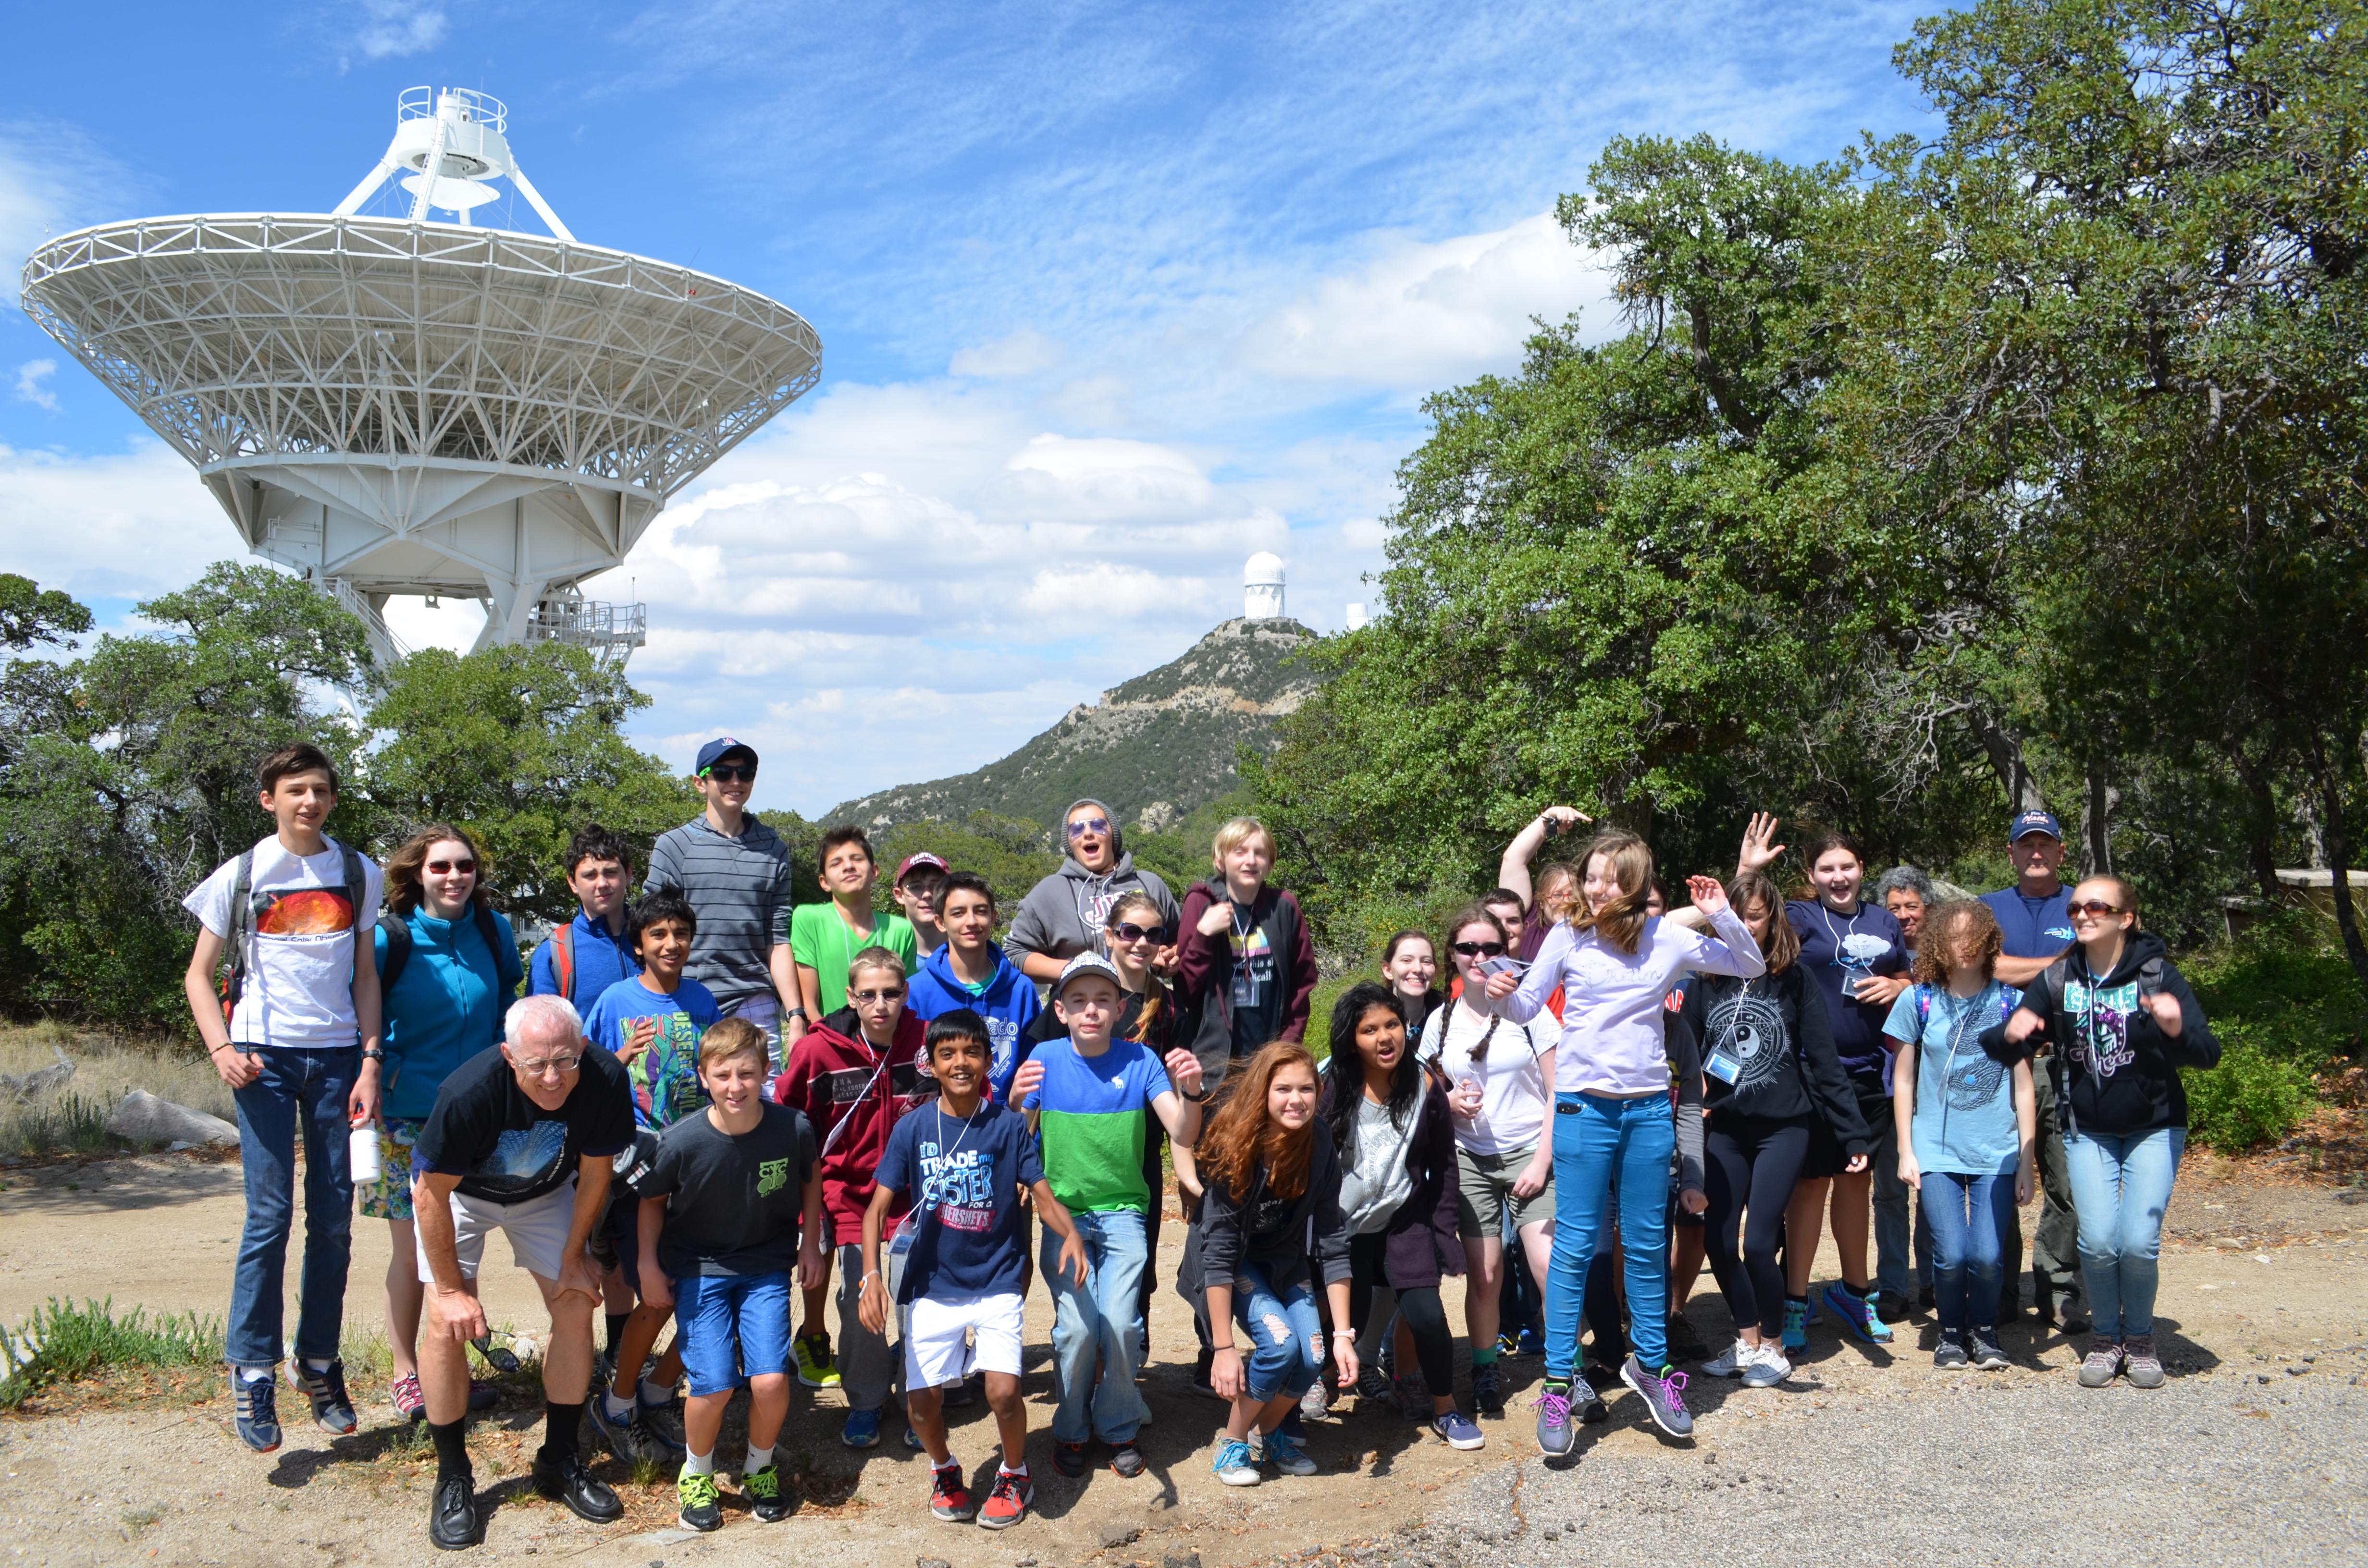 Summer Program - Science | University of Arizona: Astronomy Camp for Teens